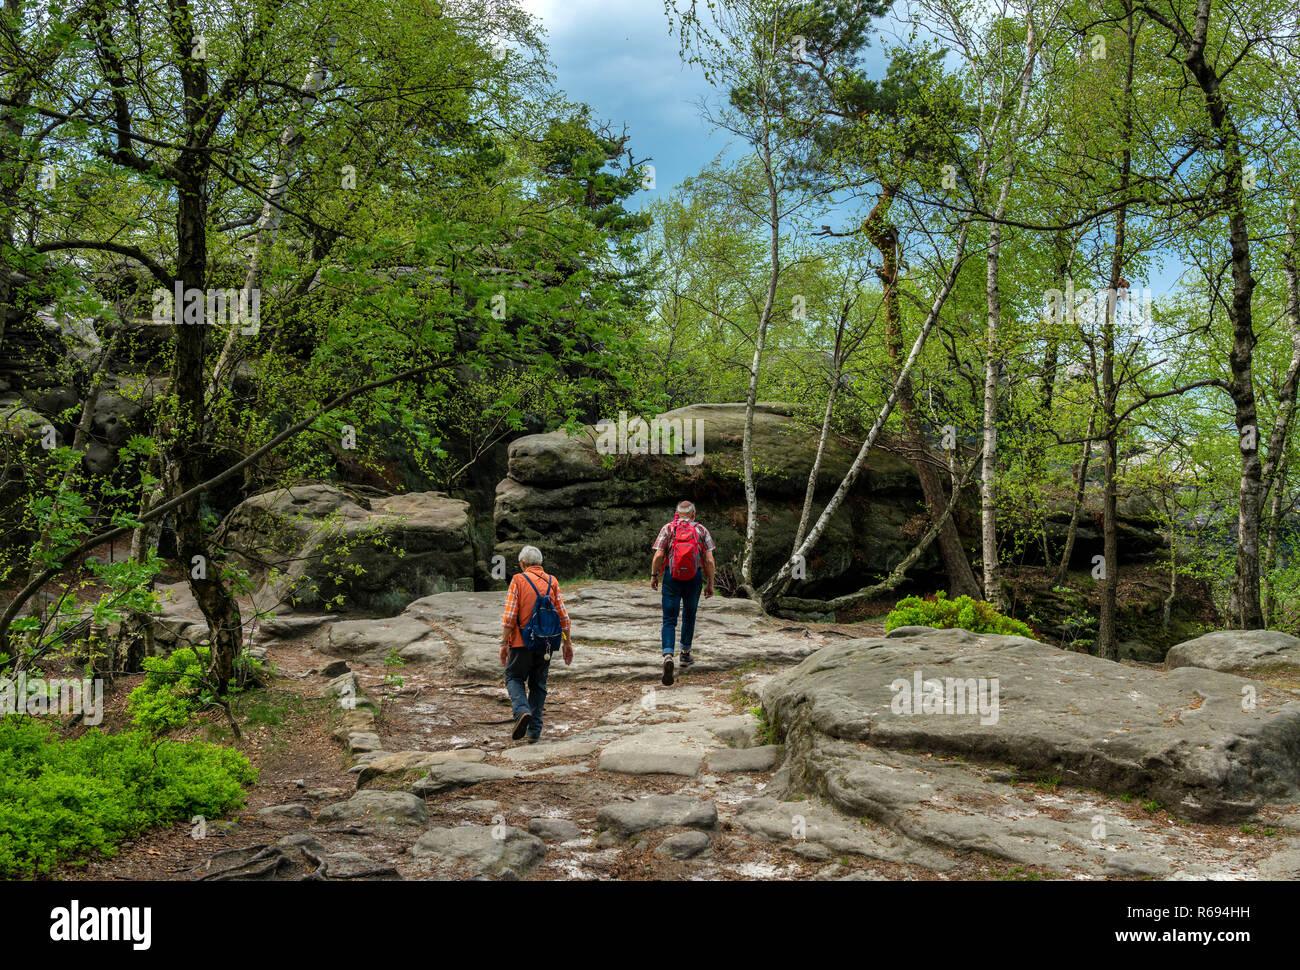 Seniors Hiking At The Pfaff Stone In Saxony - Stock Image